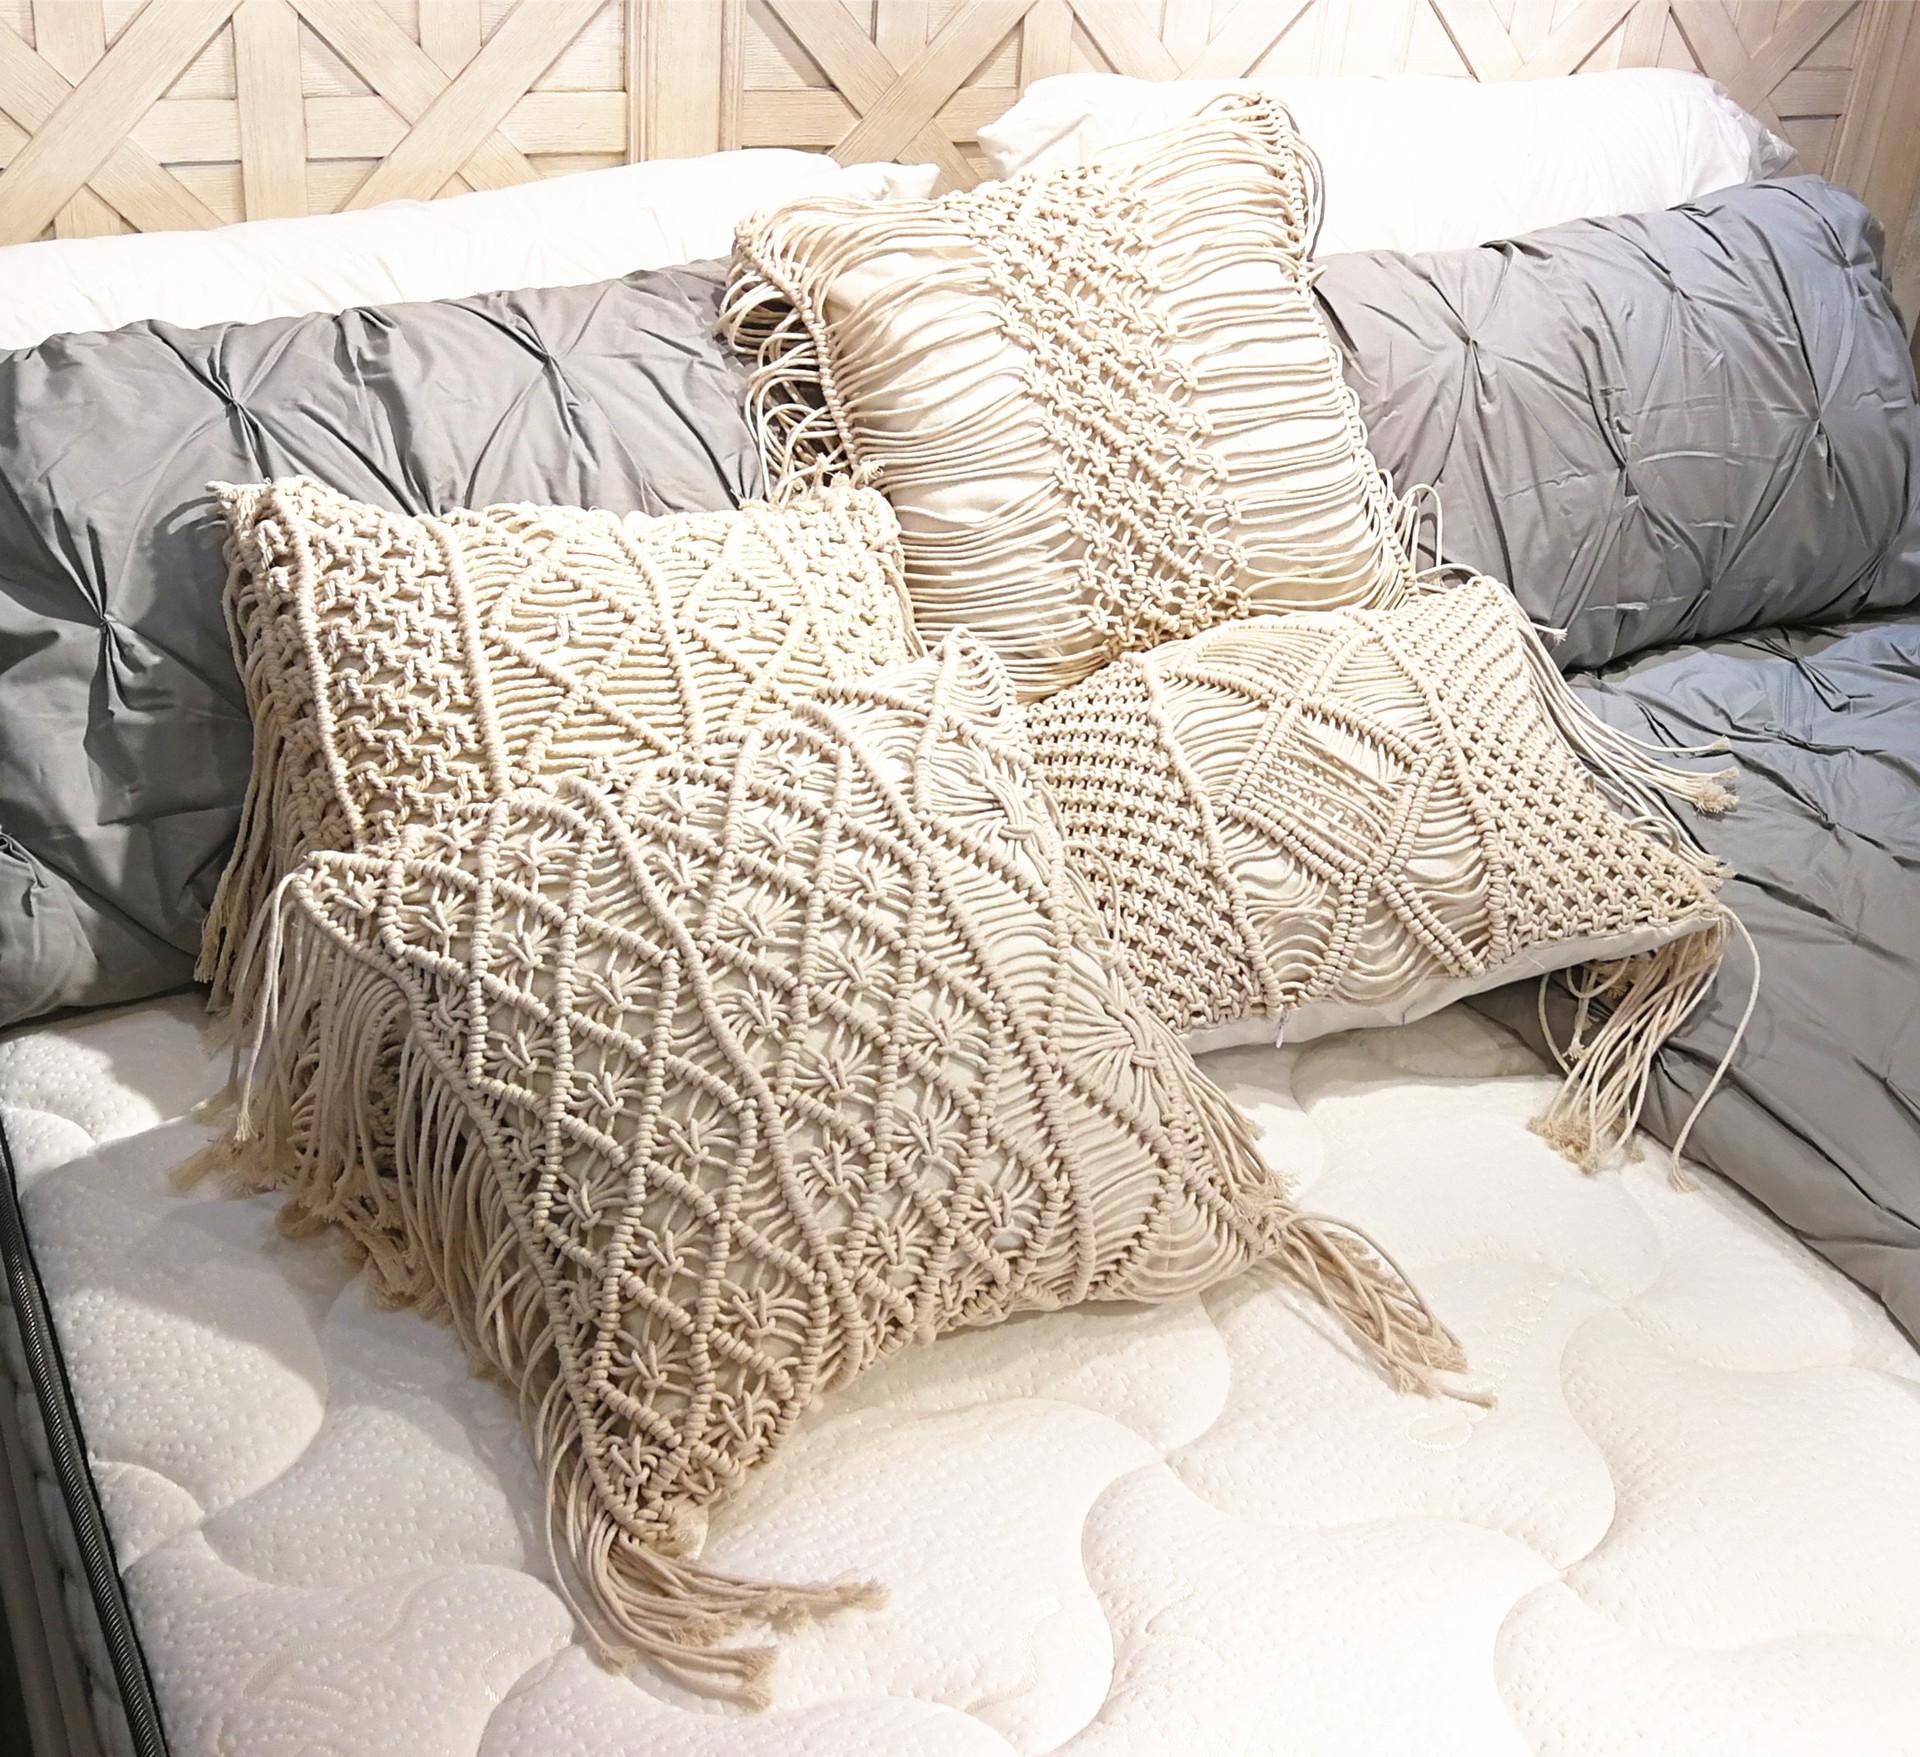 Boho Decorative Pillows Macrame Bed Throw Pillows Beige Zipper Tassel Handmade Knit Pillowcases Floor Cushion Couch Outdoor Cushions Clearance